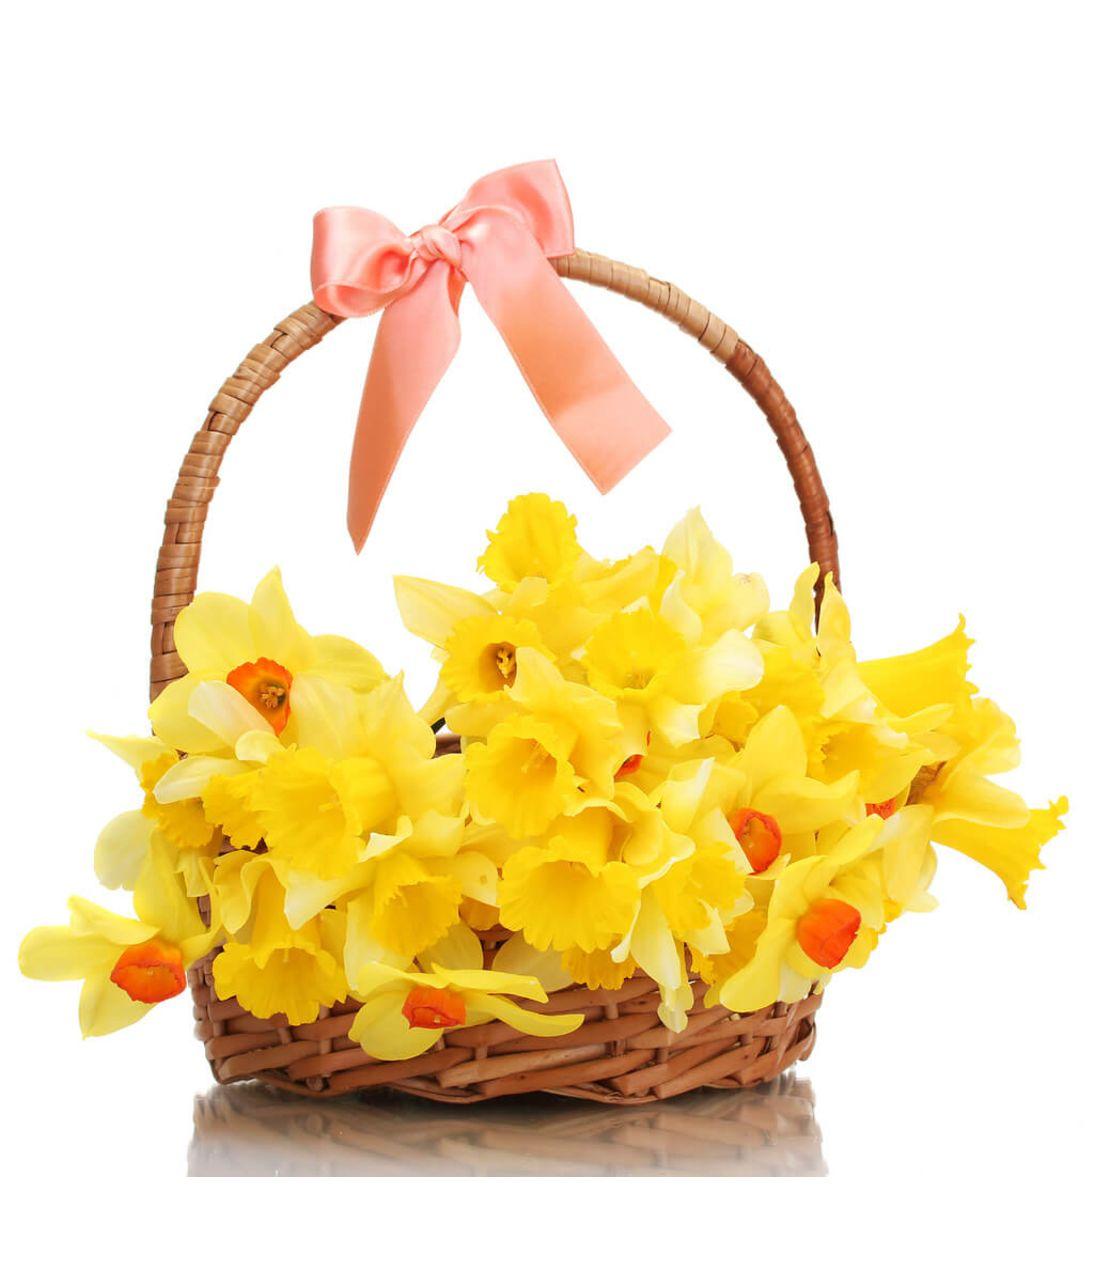 "Нарциси в кошику ""Відображення весни"". Superflowers.com.ua"